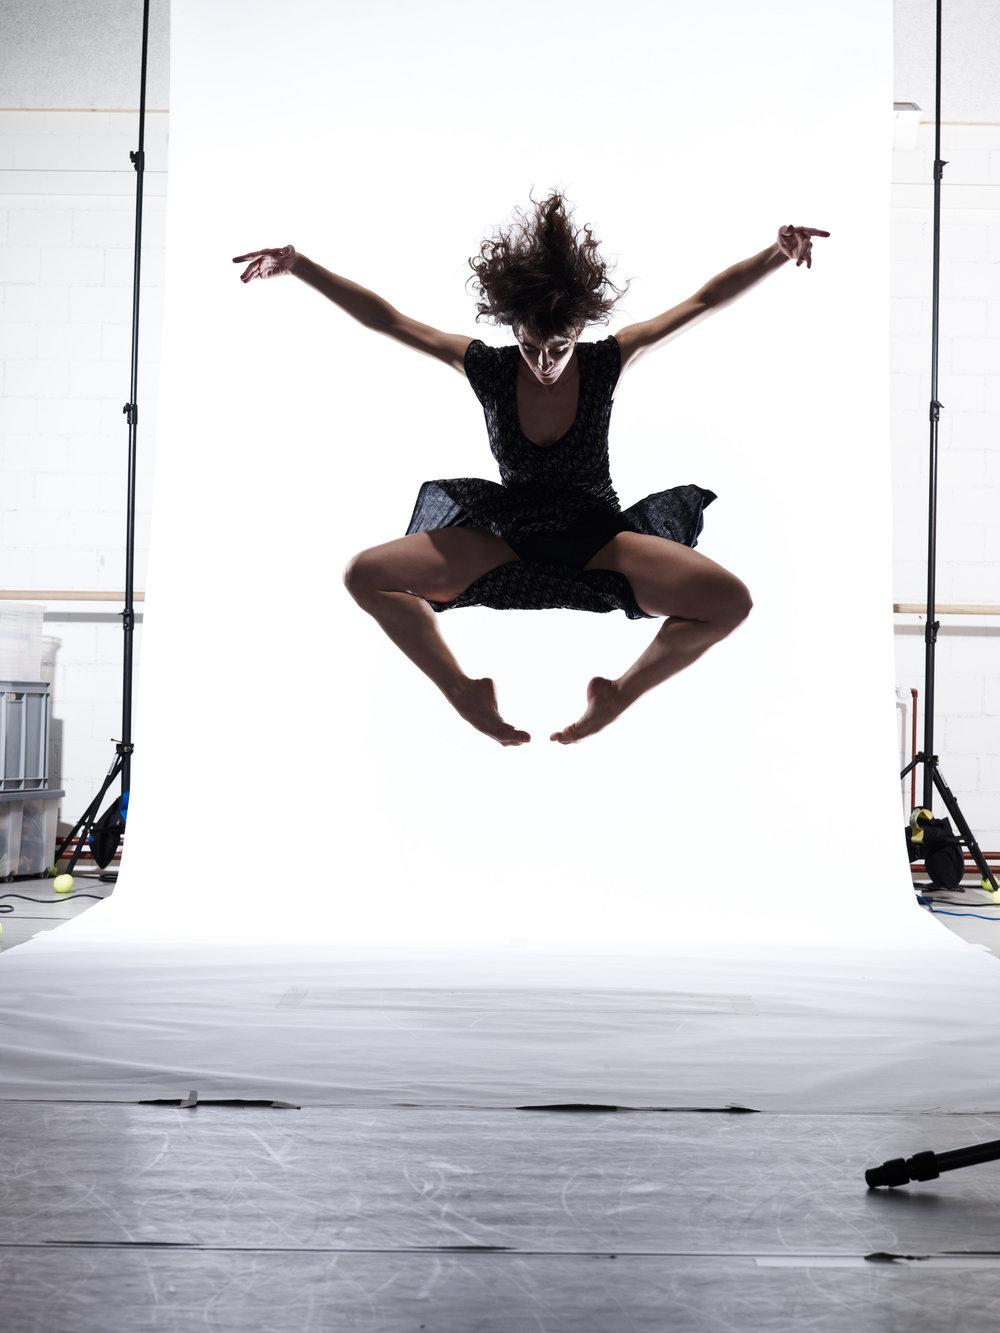 Bern_Ballet08_2-006011.jpg